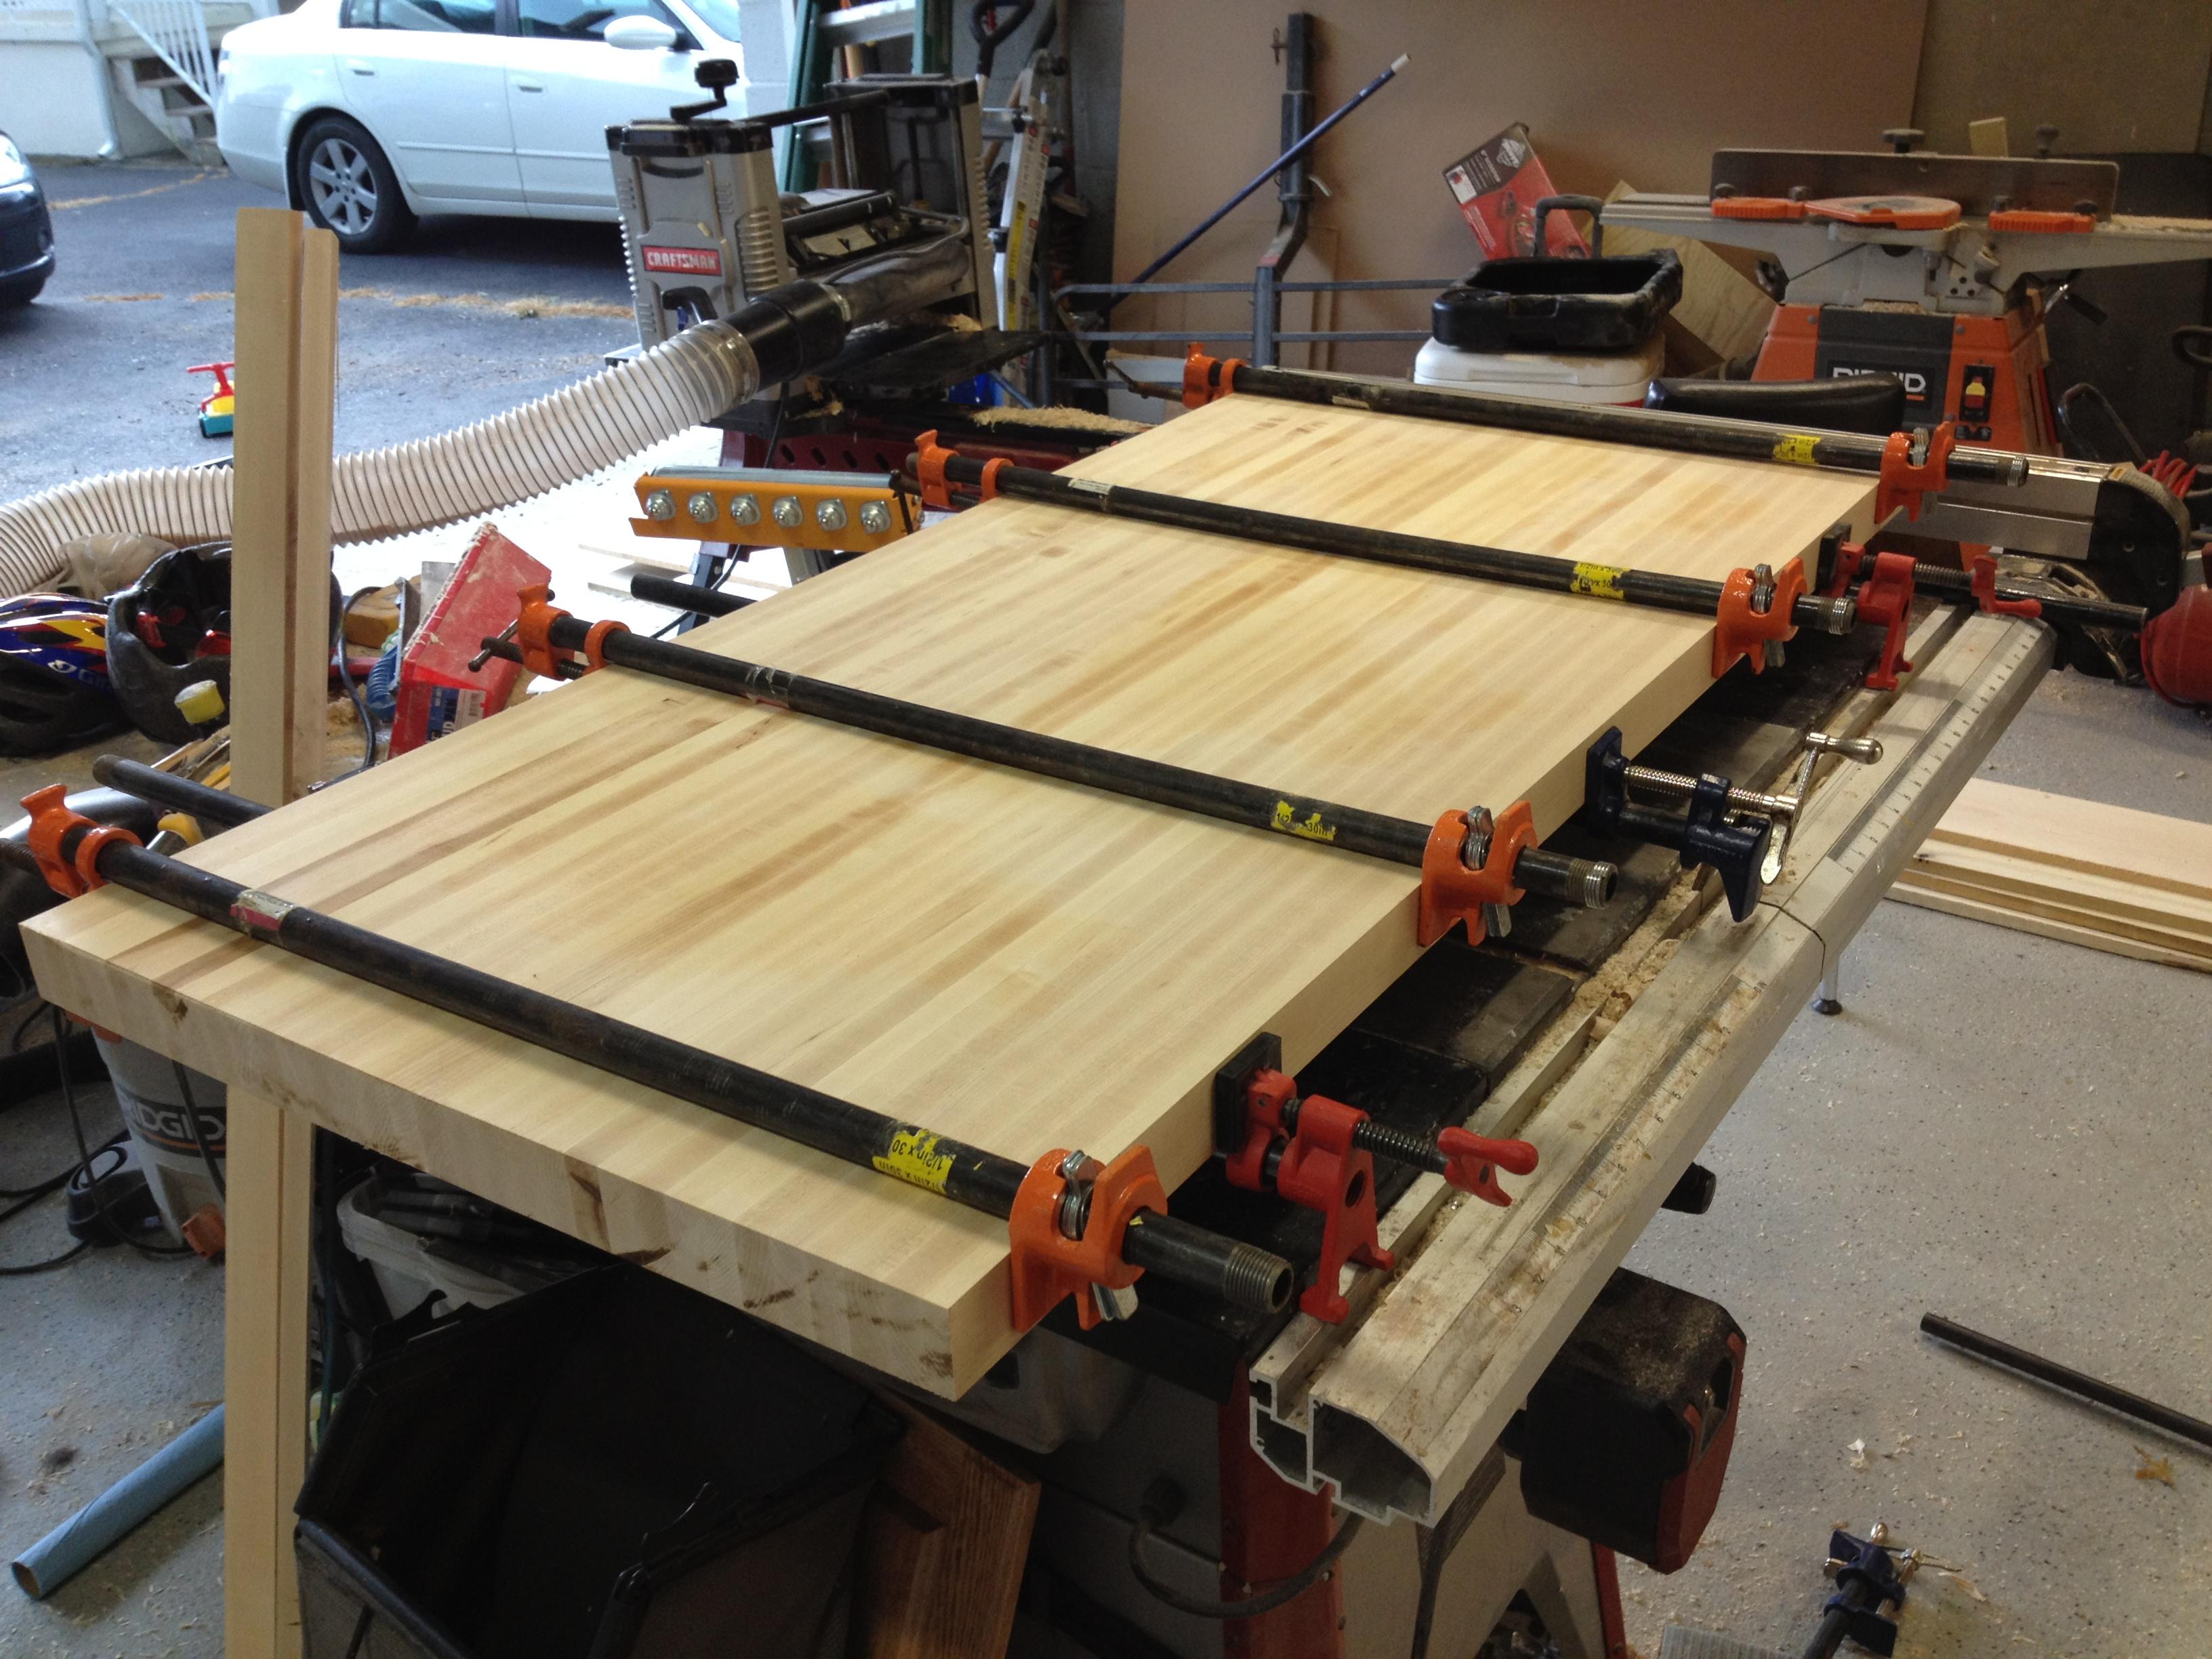 8 steps to building a butcher block countertop pennington millworks. Black Bedroom Furniture Sets. Home Design Ideas